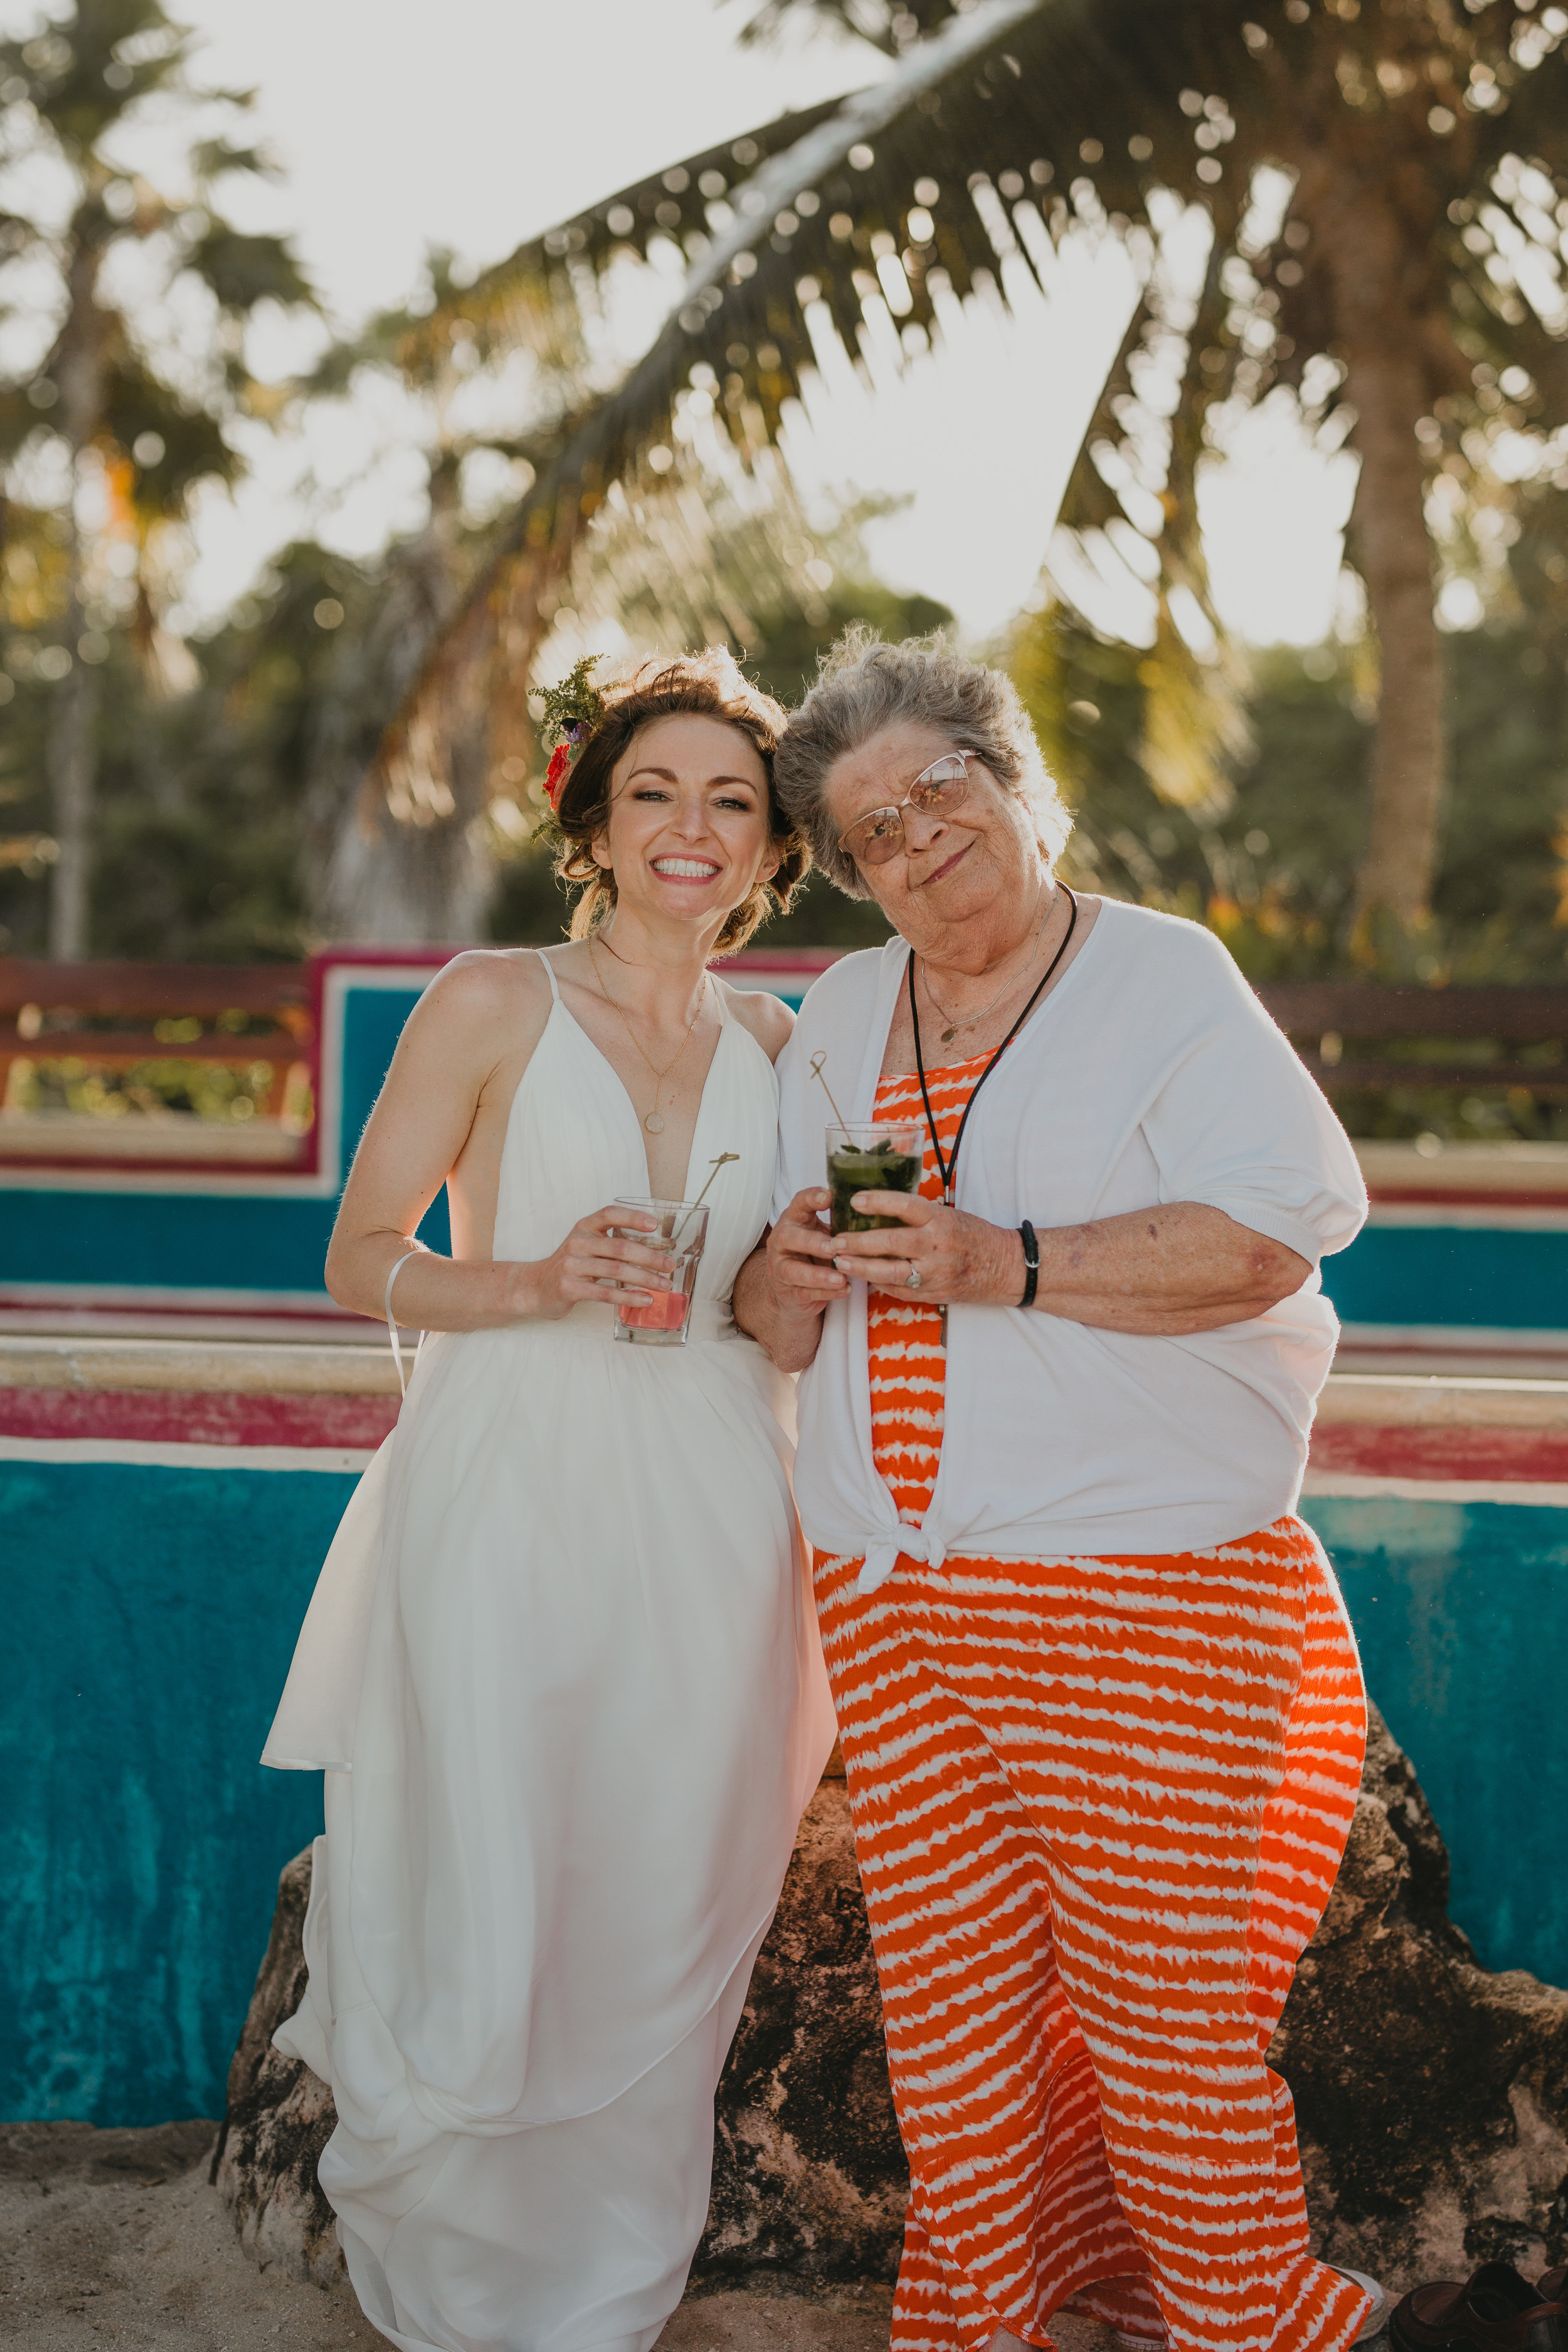 Nicole-Daacke-Photography-beachfront-akumal-destionation-wedding-tulum-mexico-elopement-photographer-destination-wedding-inspiration-sunset-champagne-pop-boho-bride-ocean-tropical-bohemian-tulum-wedding-photos-174.jpg